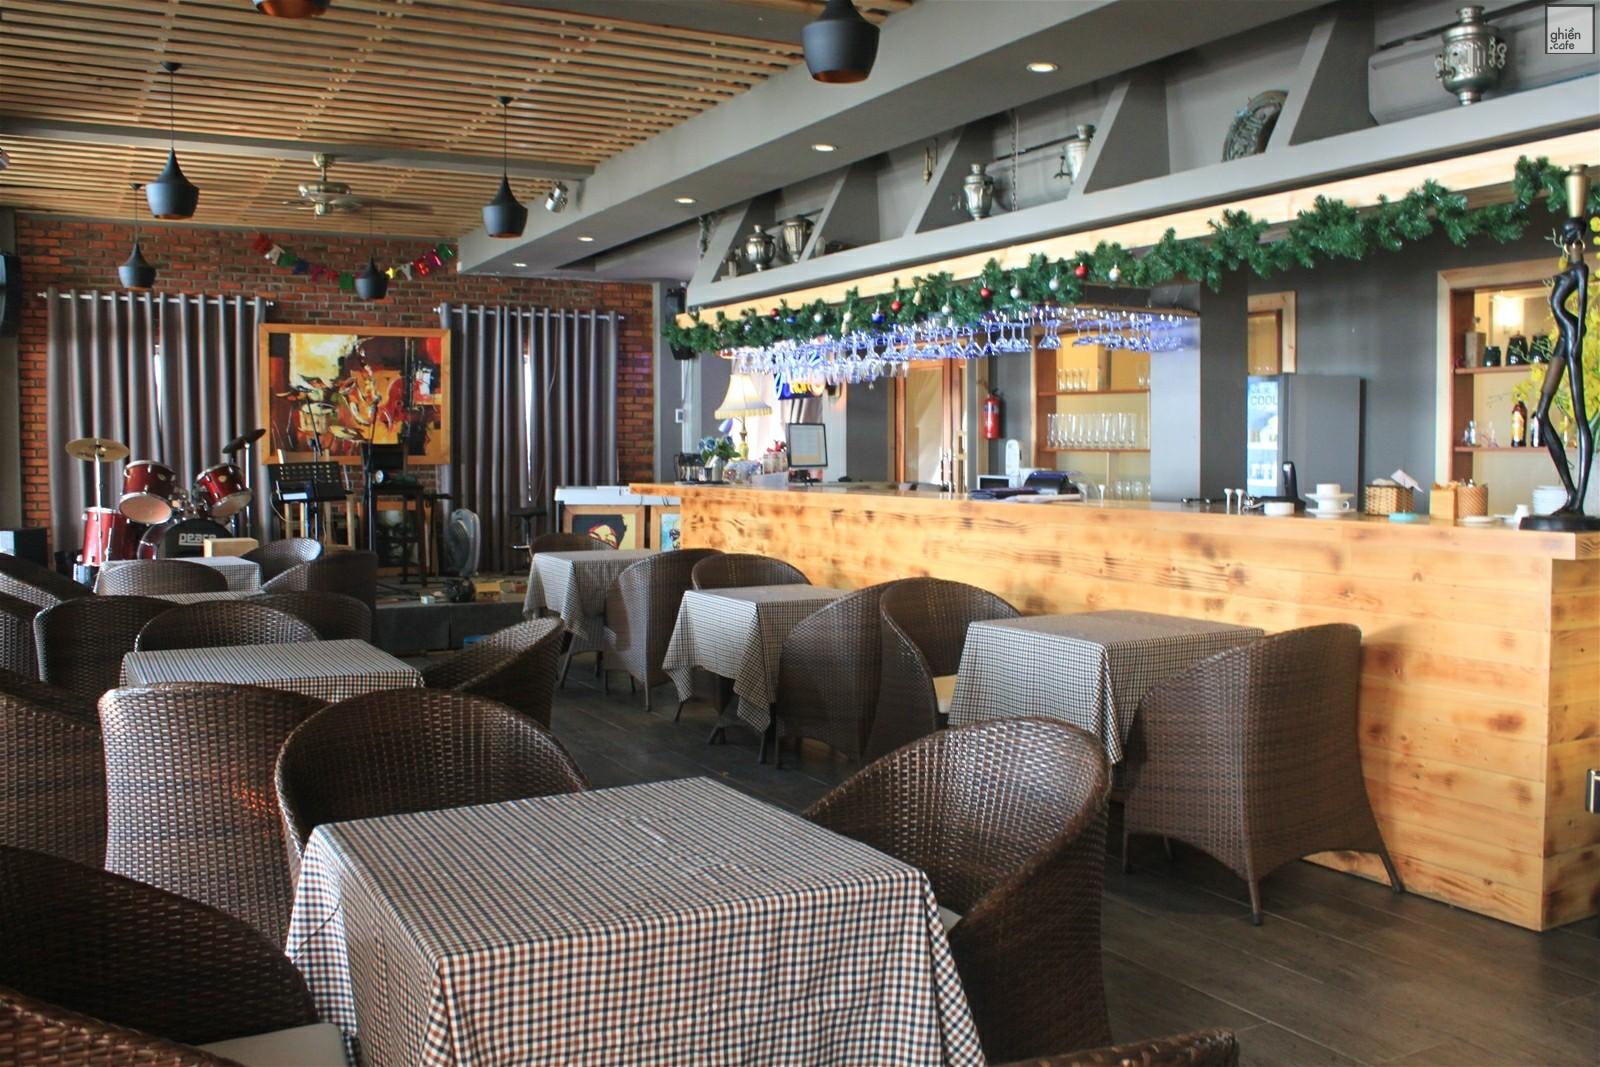 Jazz Bar - Cafe - Restaurant - Võ Nguyên Giáp